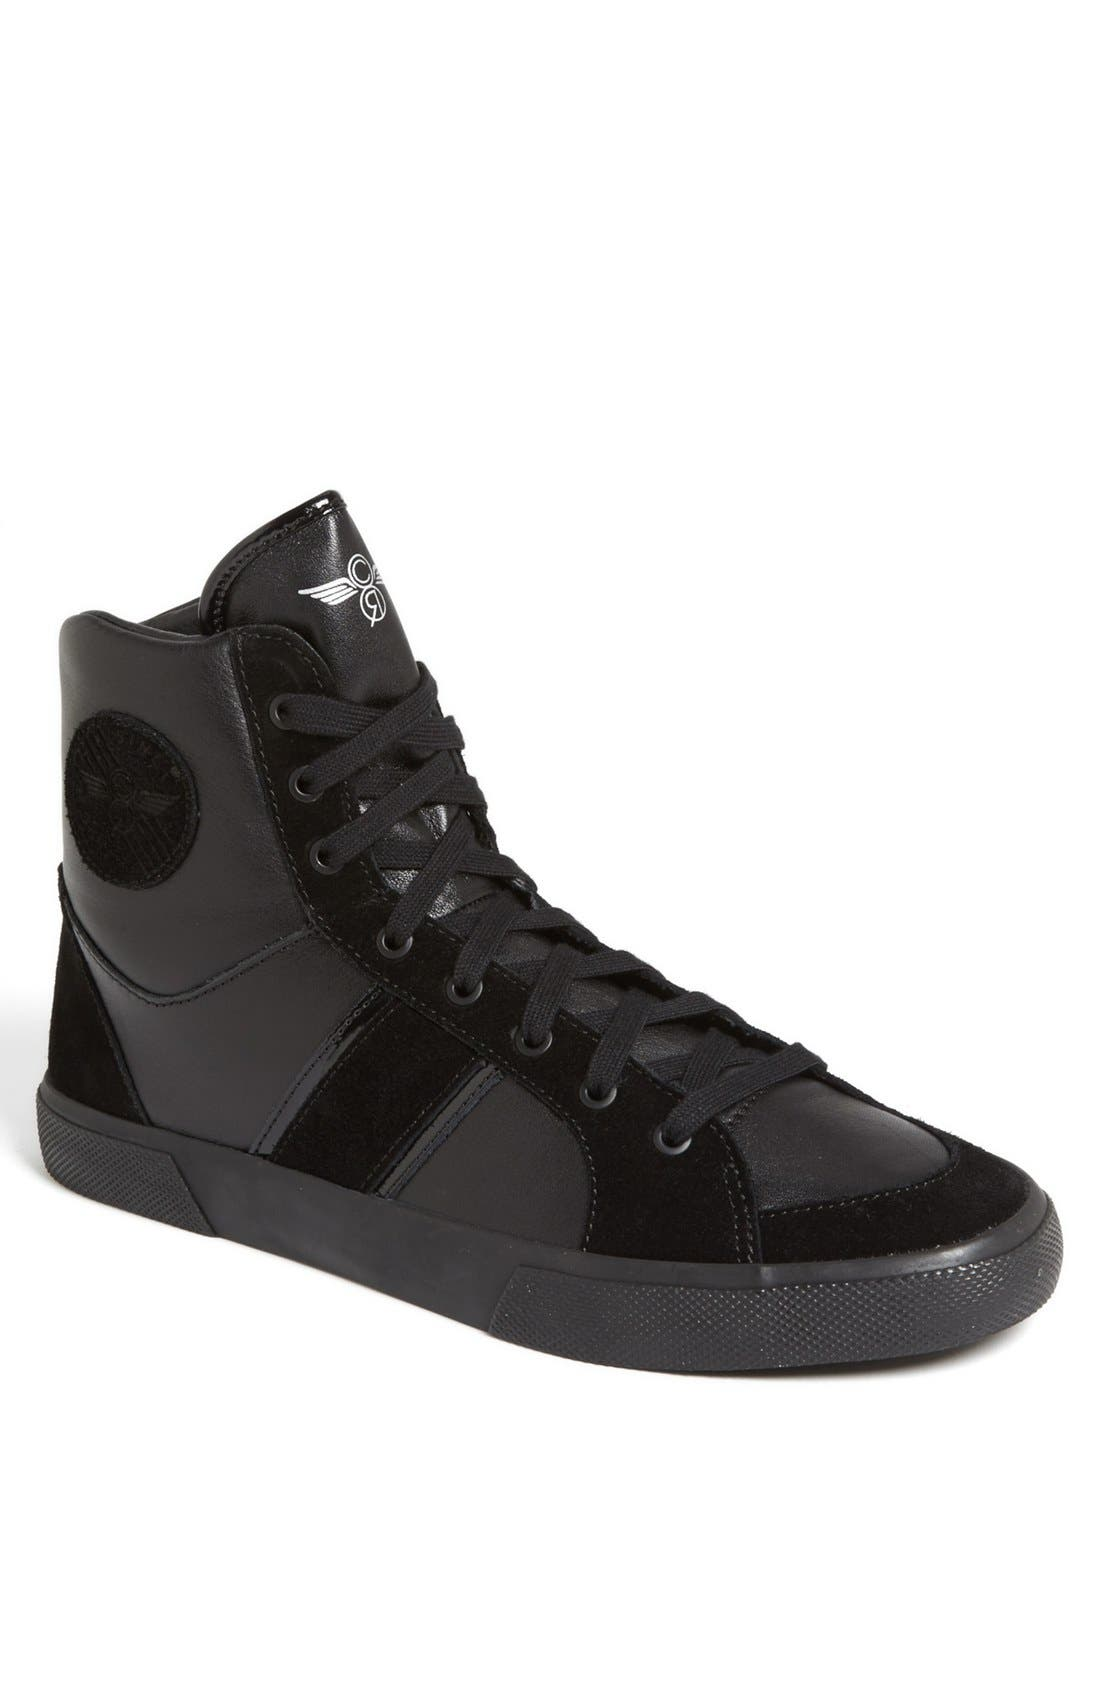 Main Image - Creative Recreation 'Fenelli' High Top Sneaker